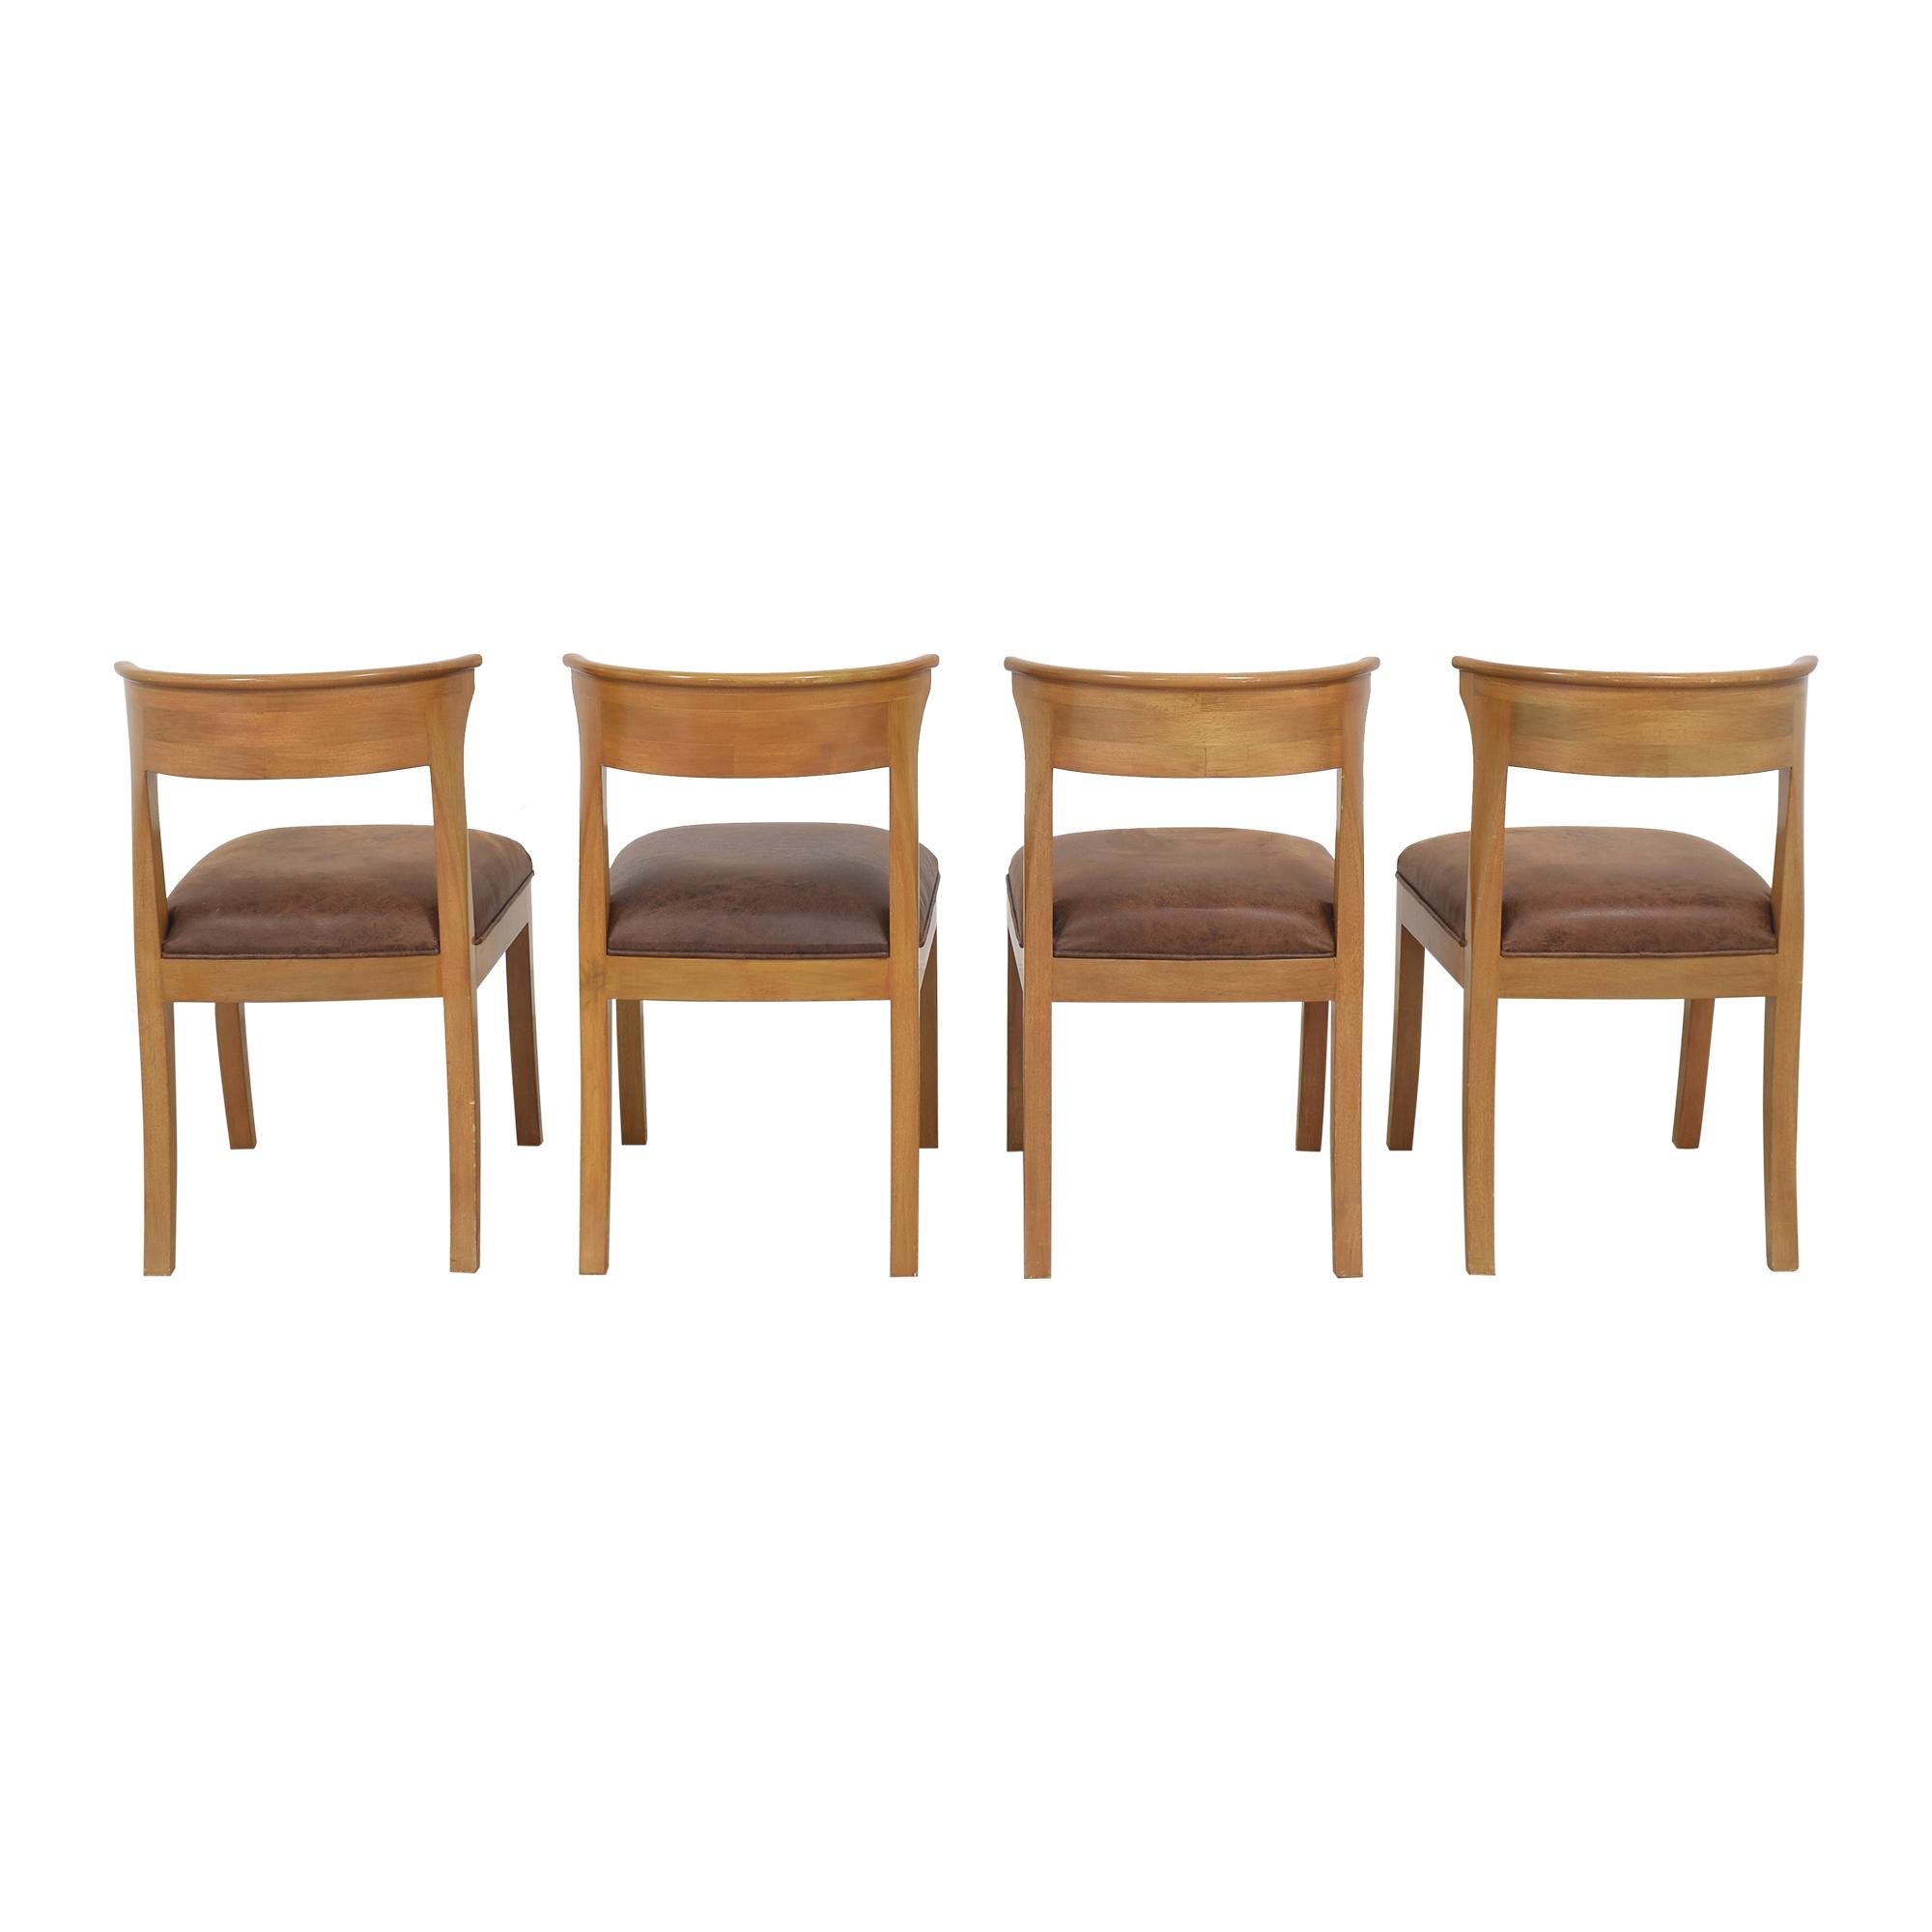 shop Bernhardt Dining Chairs Bernhardt Dining Chairs